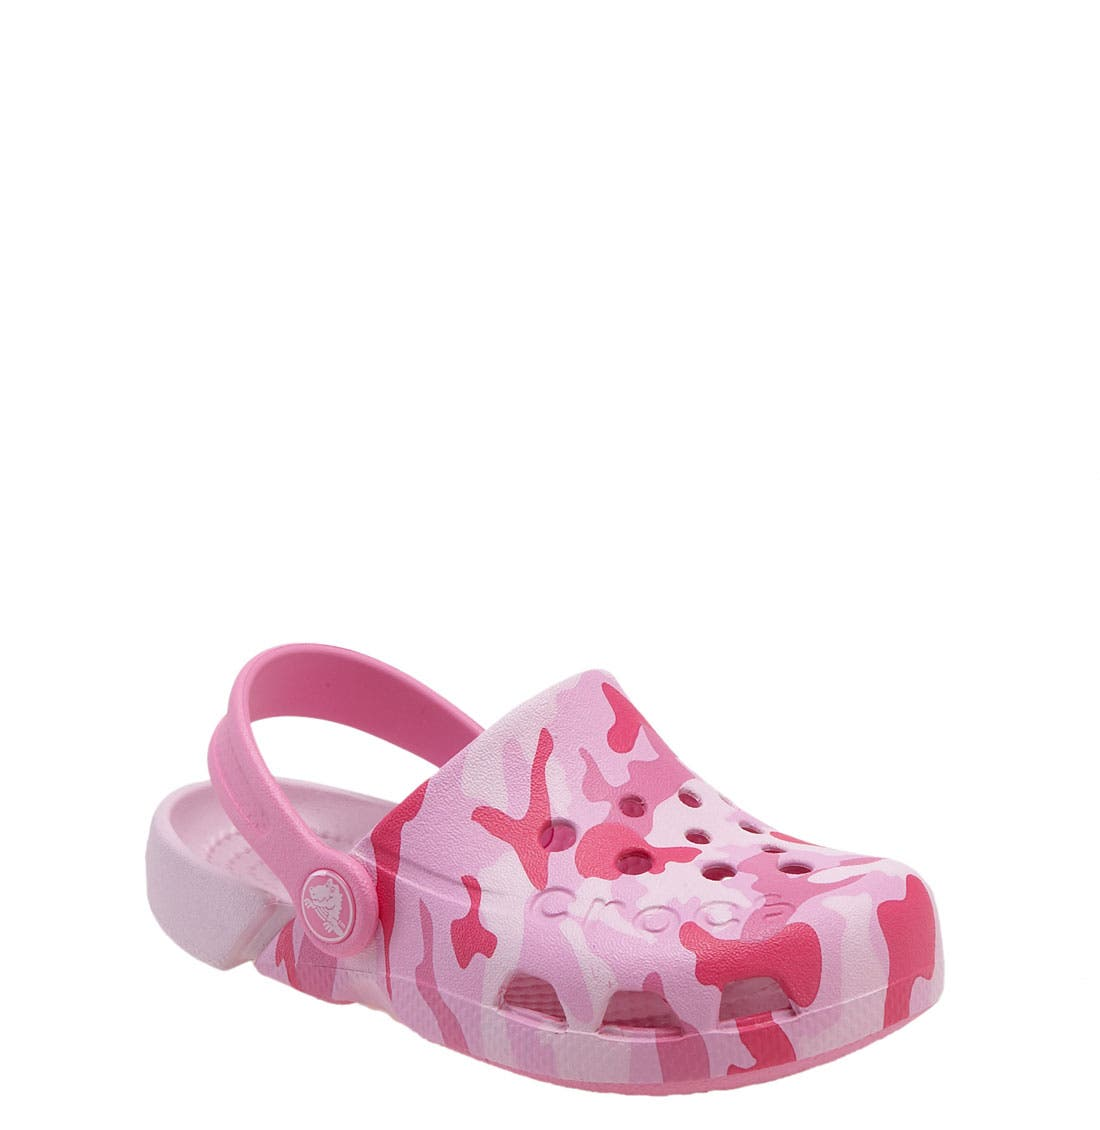 Alternate Image 1 Selected - CROCS™ 'Electro' Sandal (Baby, Walker, Toddler & Little Kid)